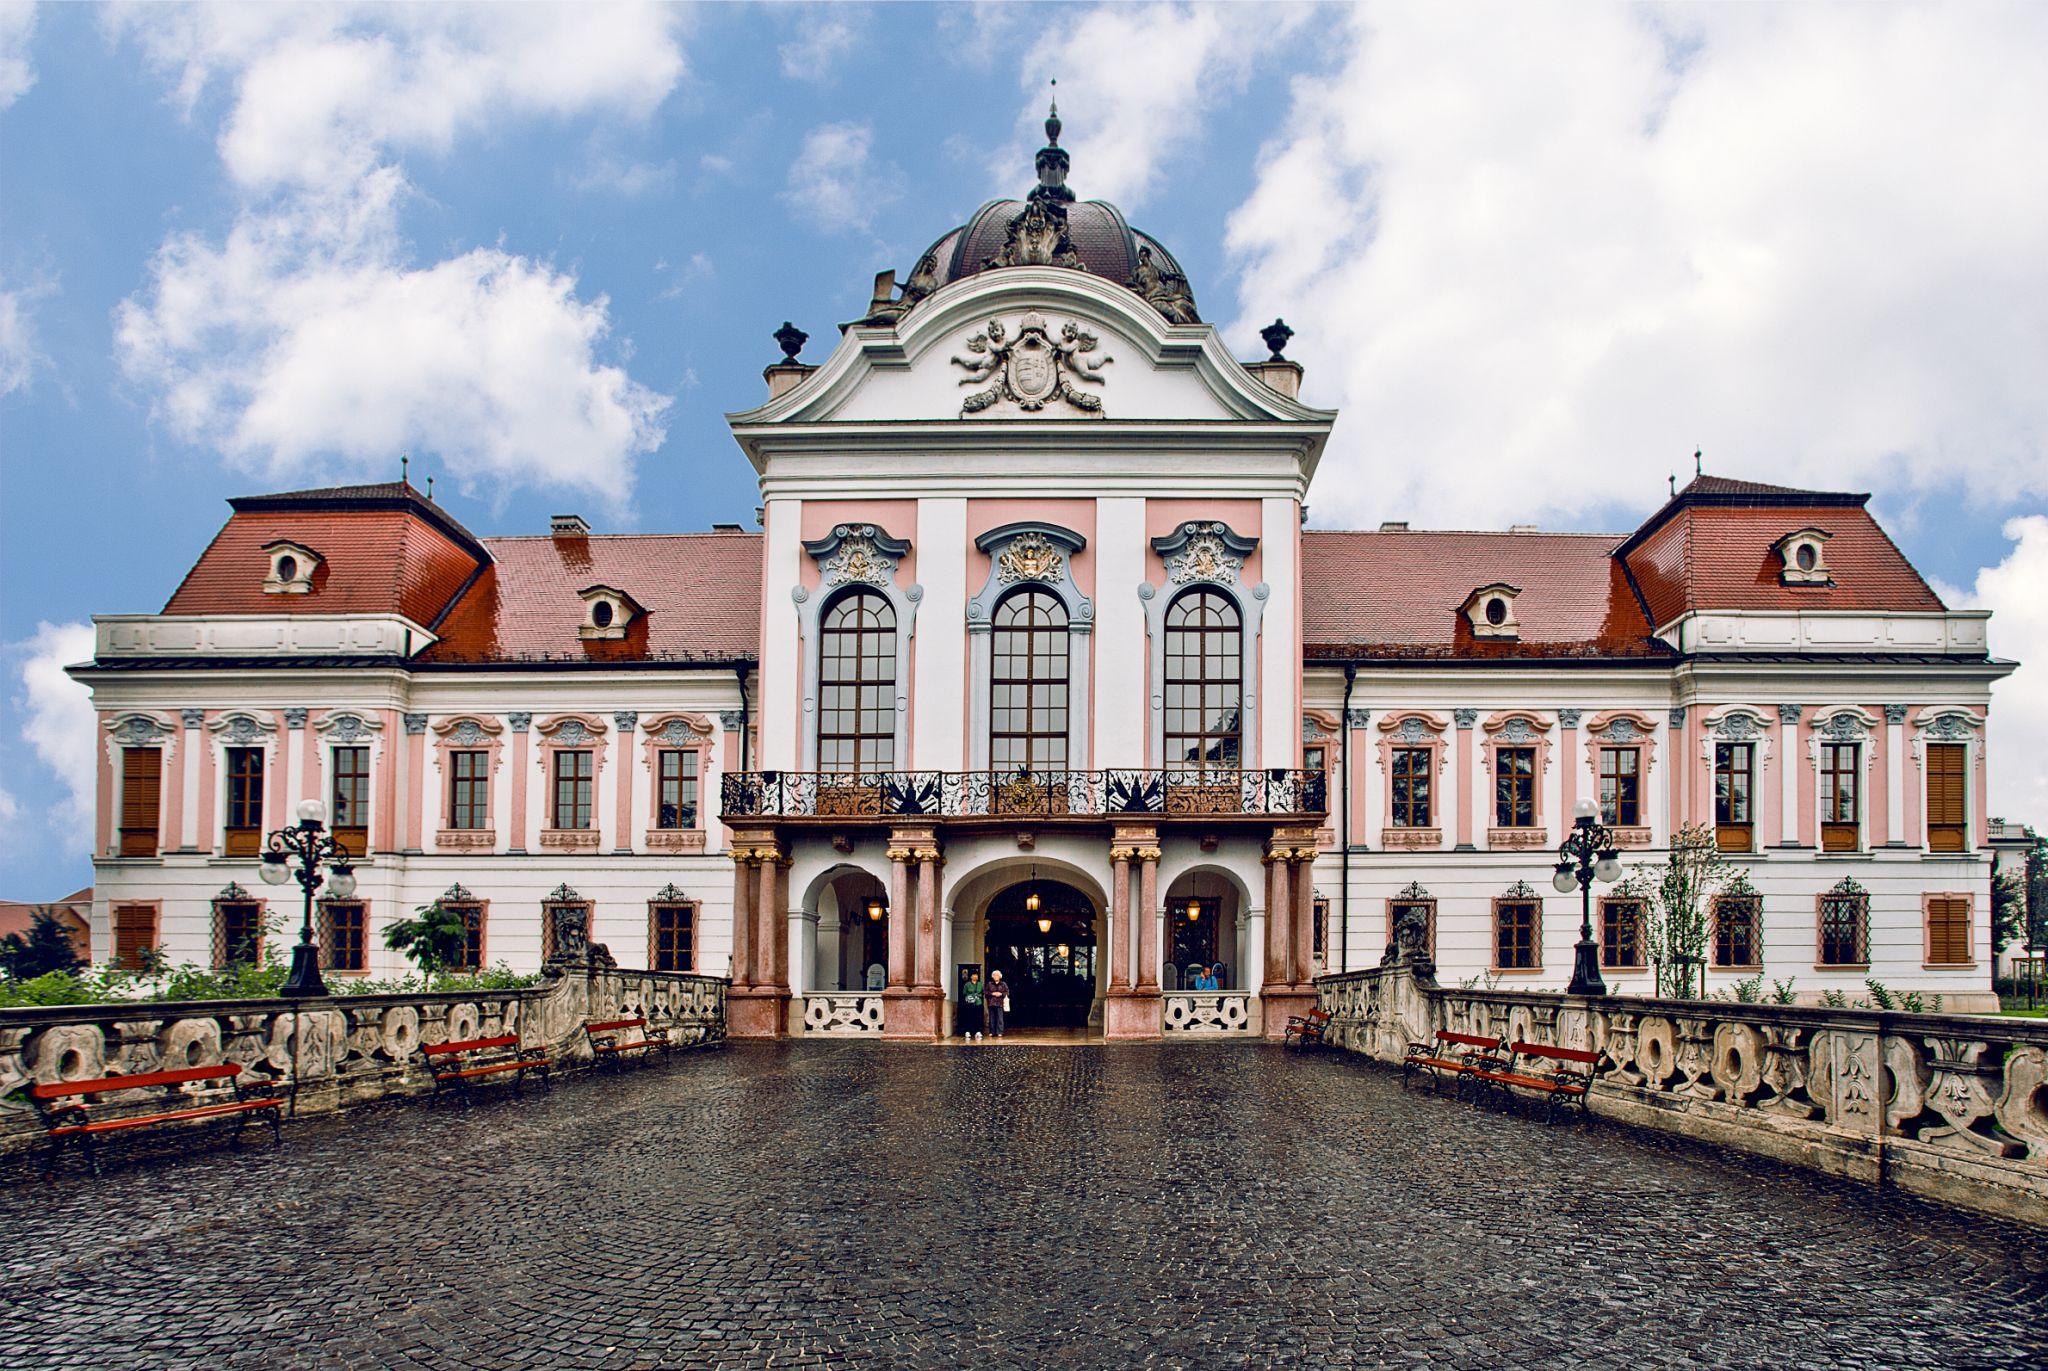 Royal Pallace in Godollo (Gödöllői Kiralyi Kastely), Hungary